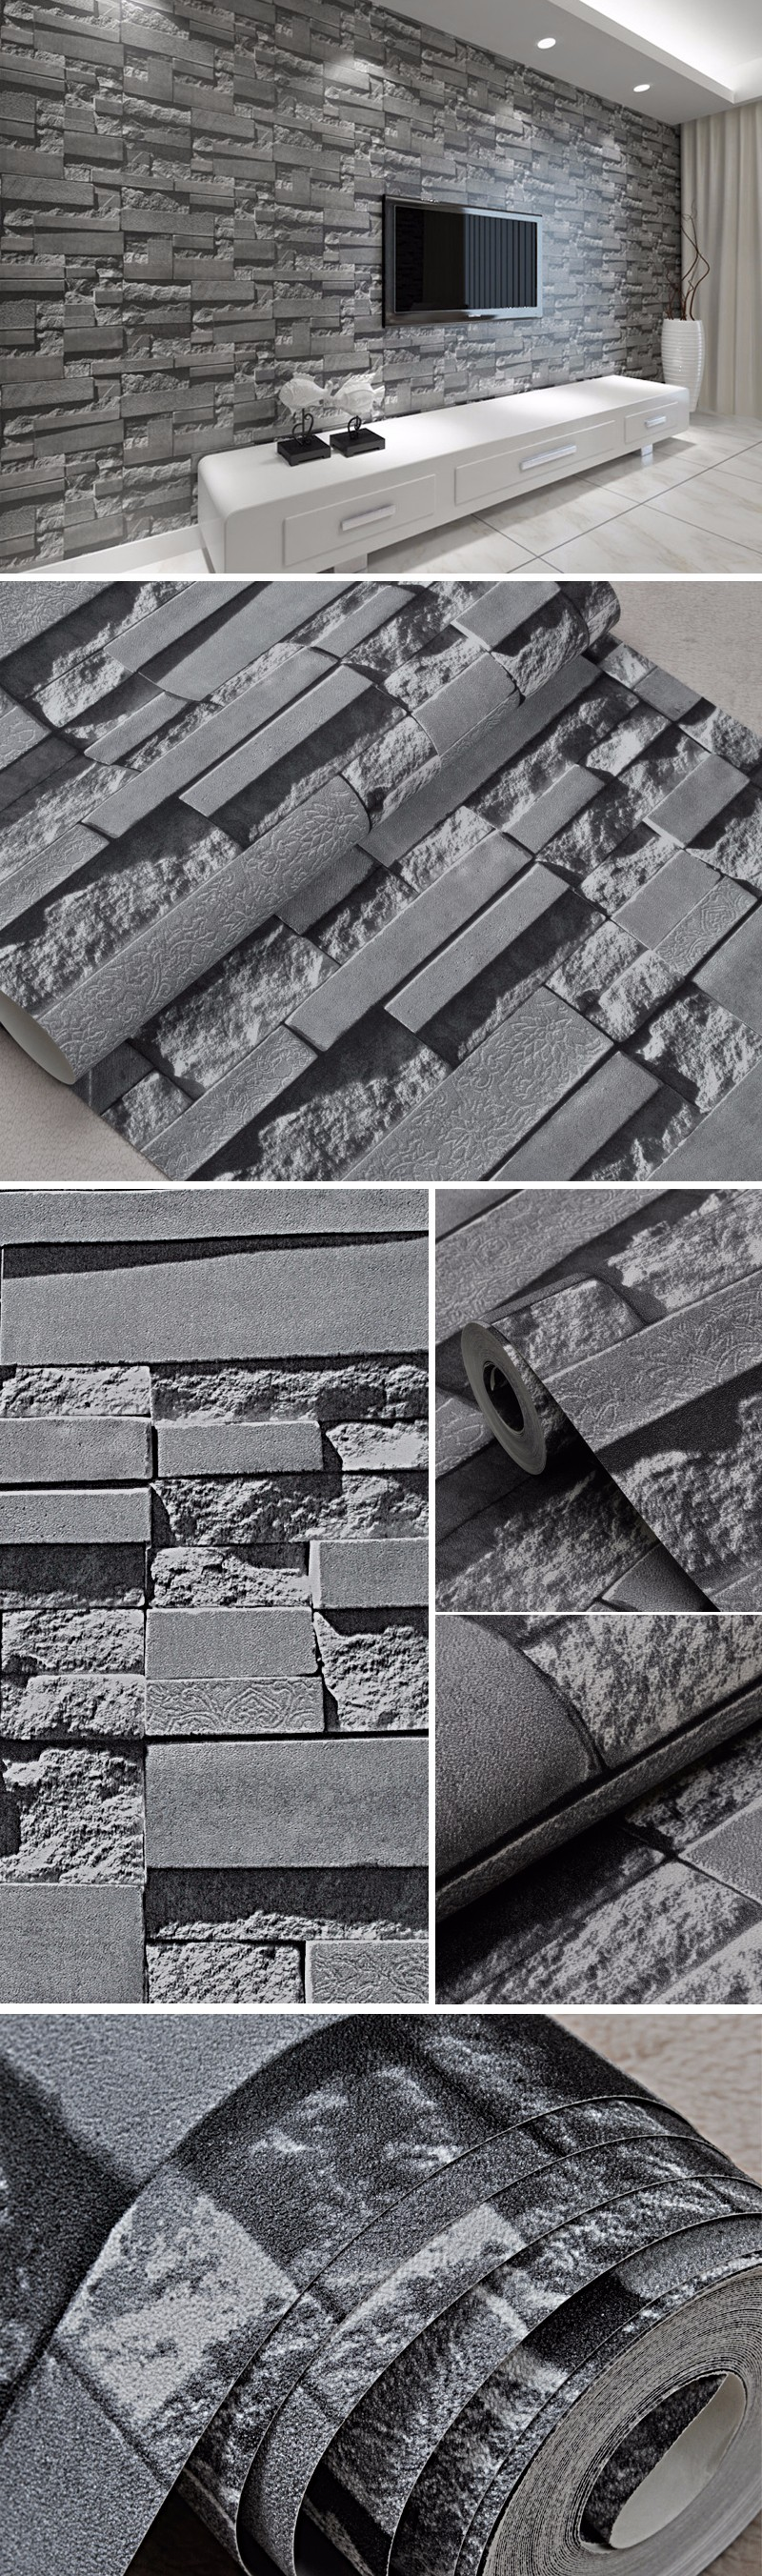 Vinyl for brick wall - Stone Wall Paper 3d Brick Wall Wallpaper Vinyl Waterproof 3d Wallpaper For Walls Roll